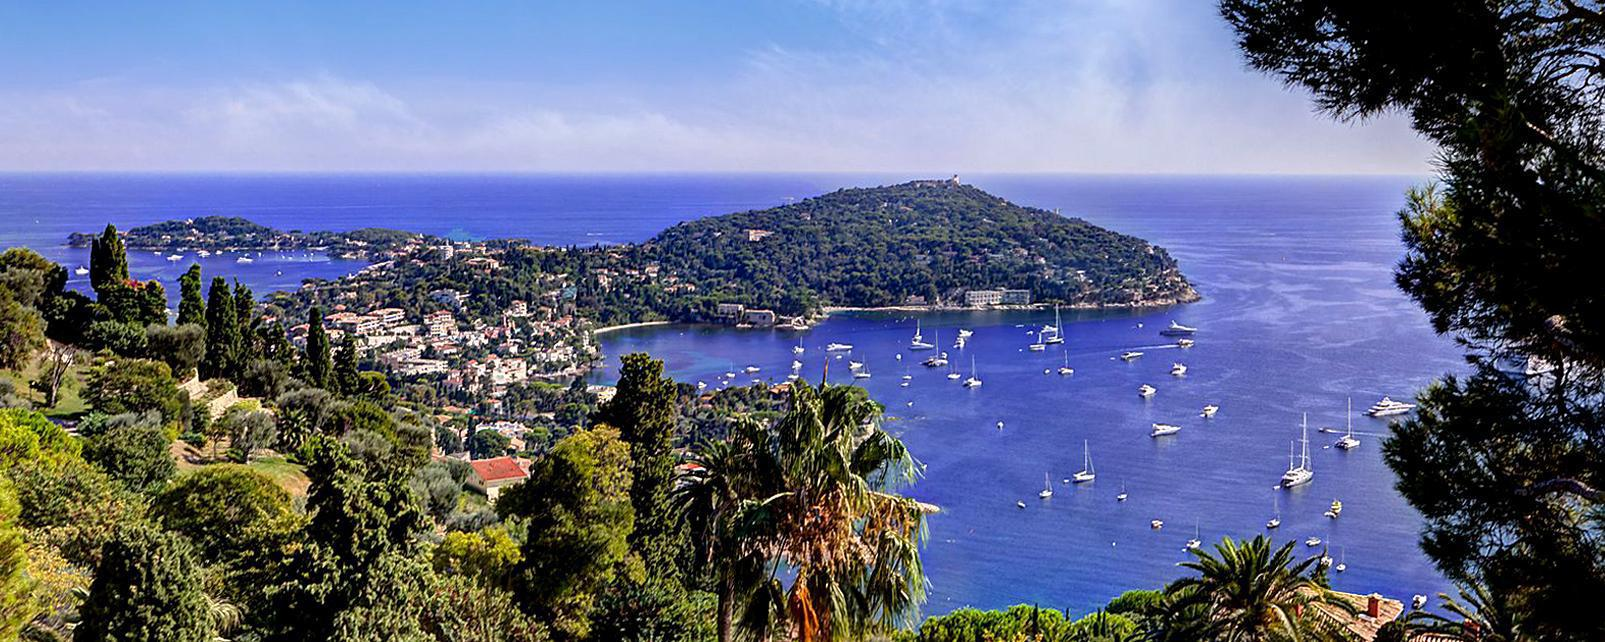 Voyage Saint Jean Cap Ferrat France Easyvoyage